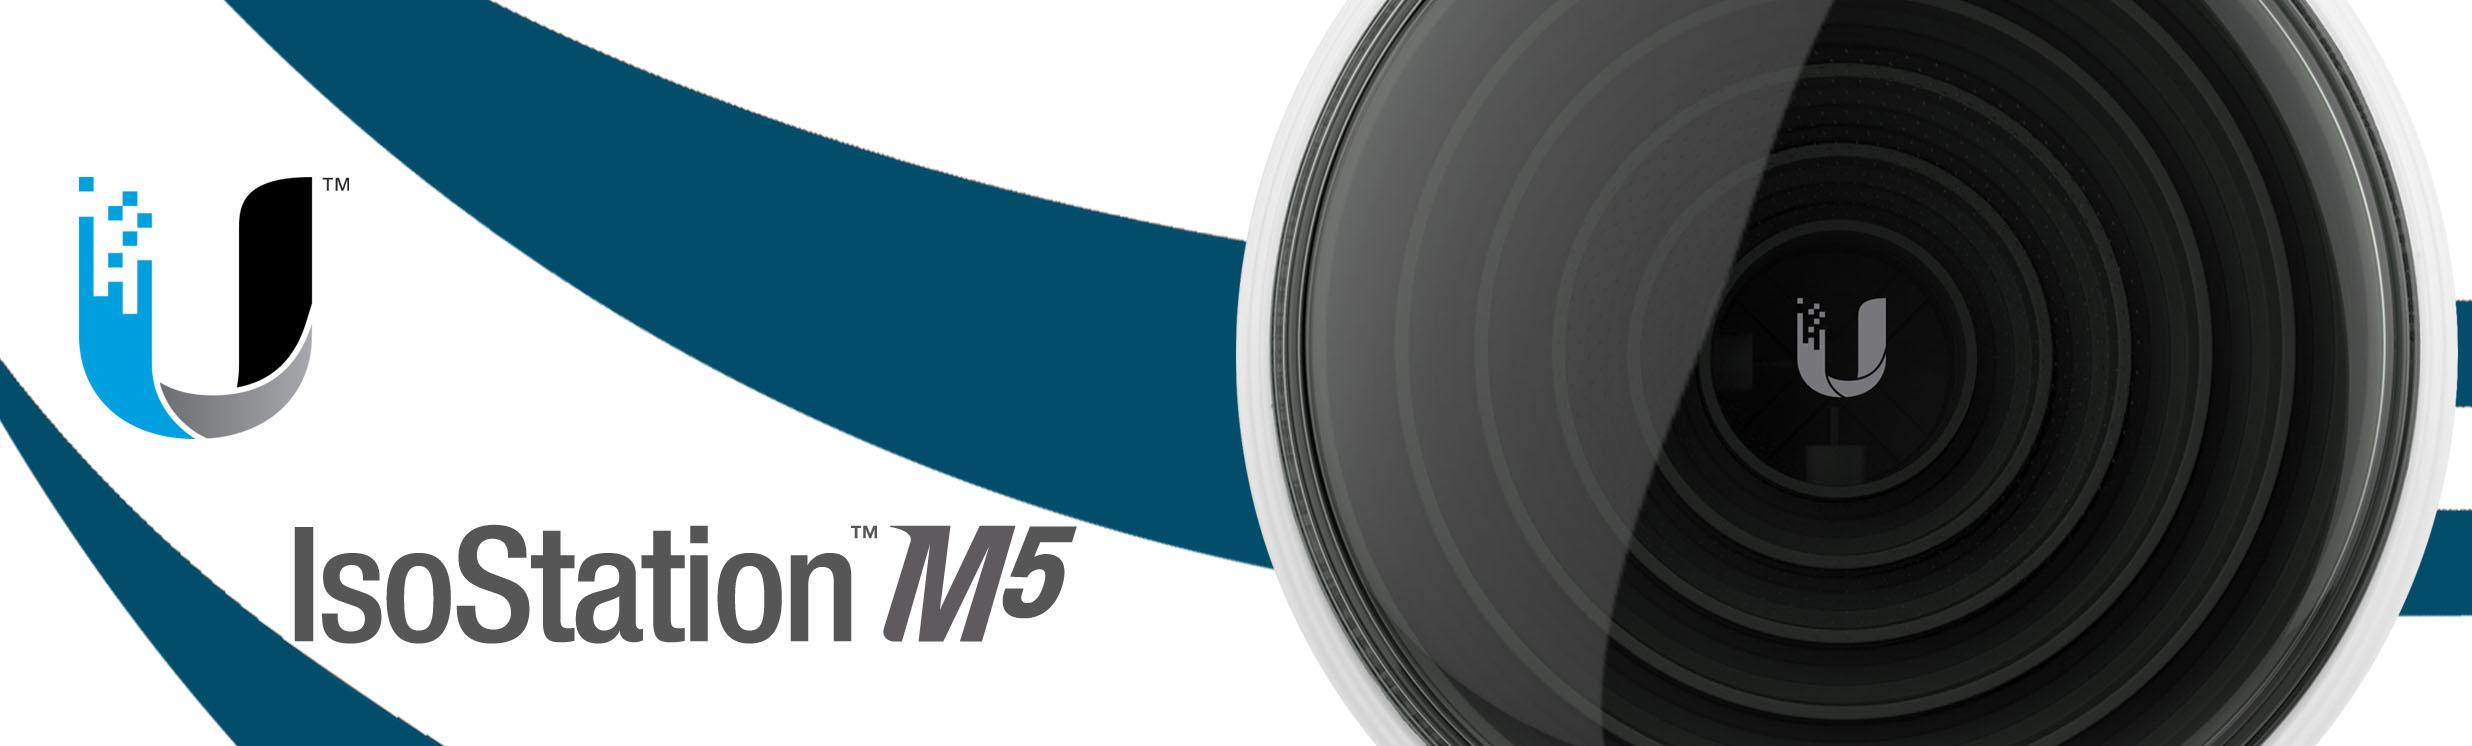 Ubiquiti IsoStation M5 / IS-M5